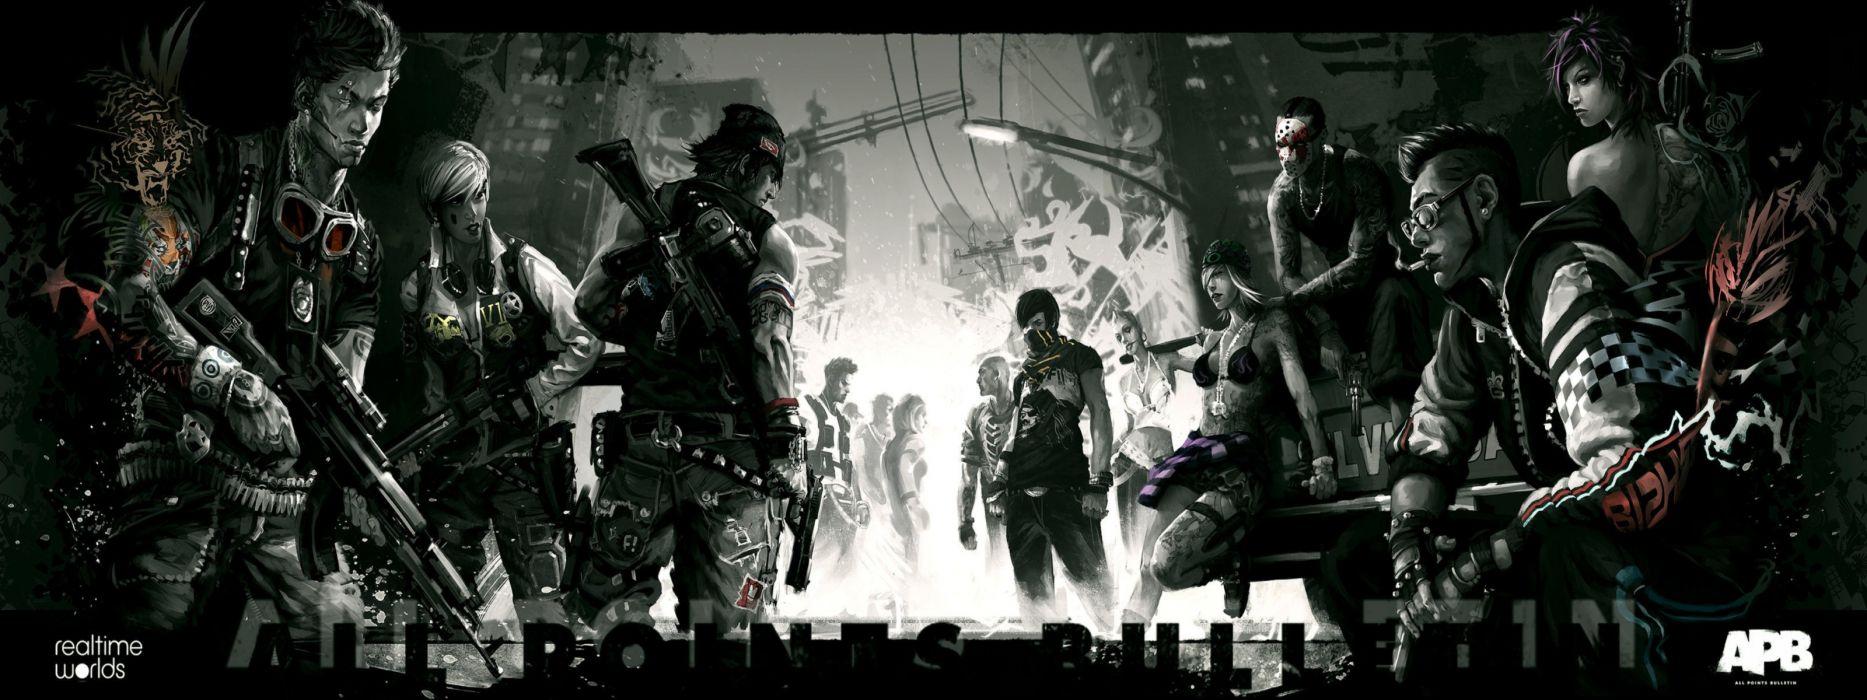 video games APB artwork wallpaper